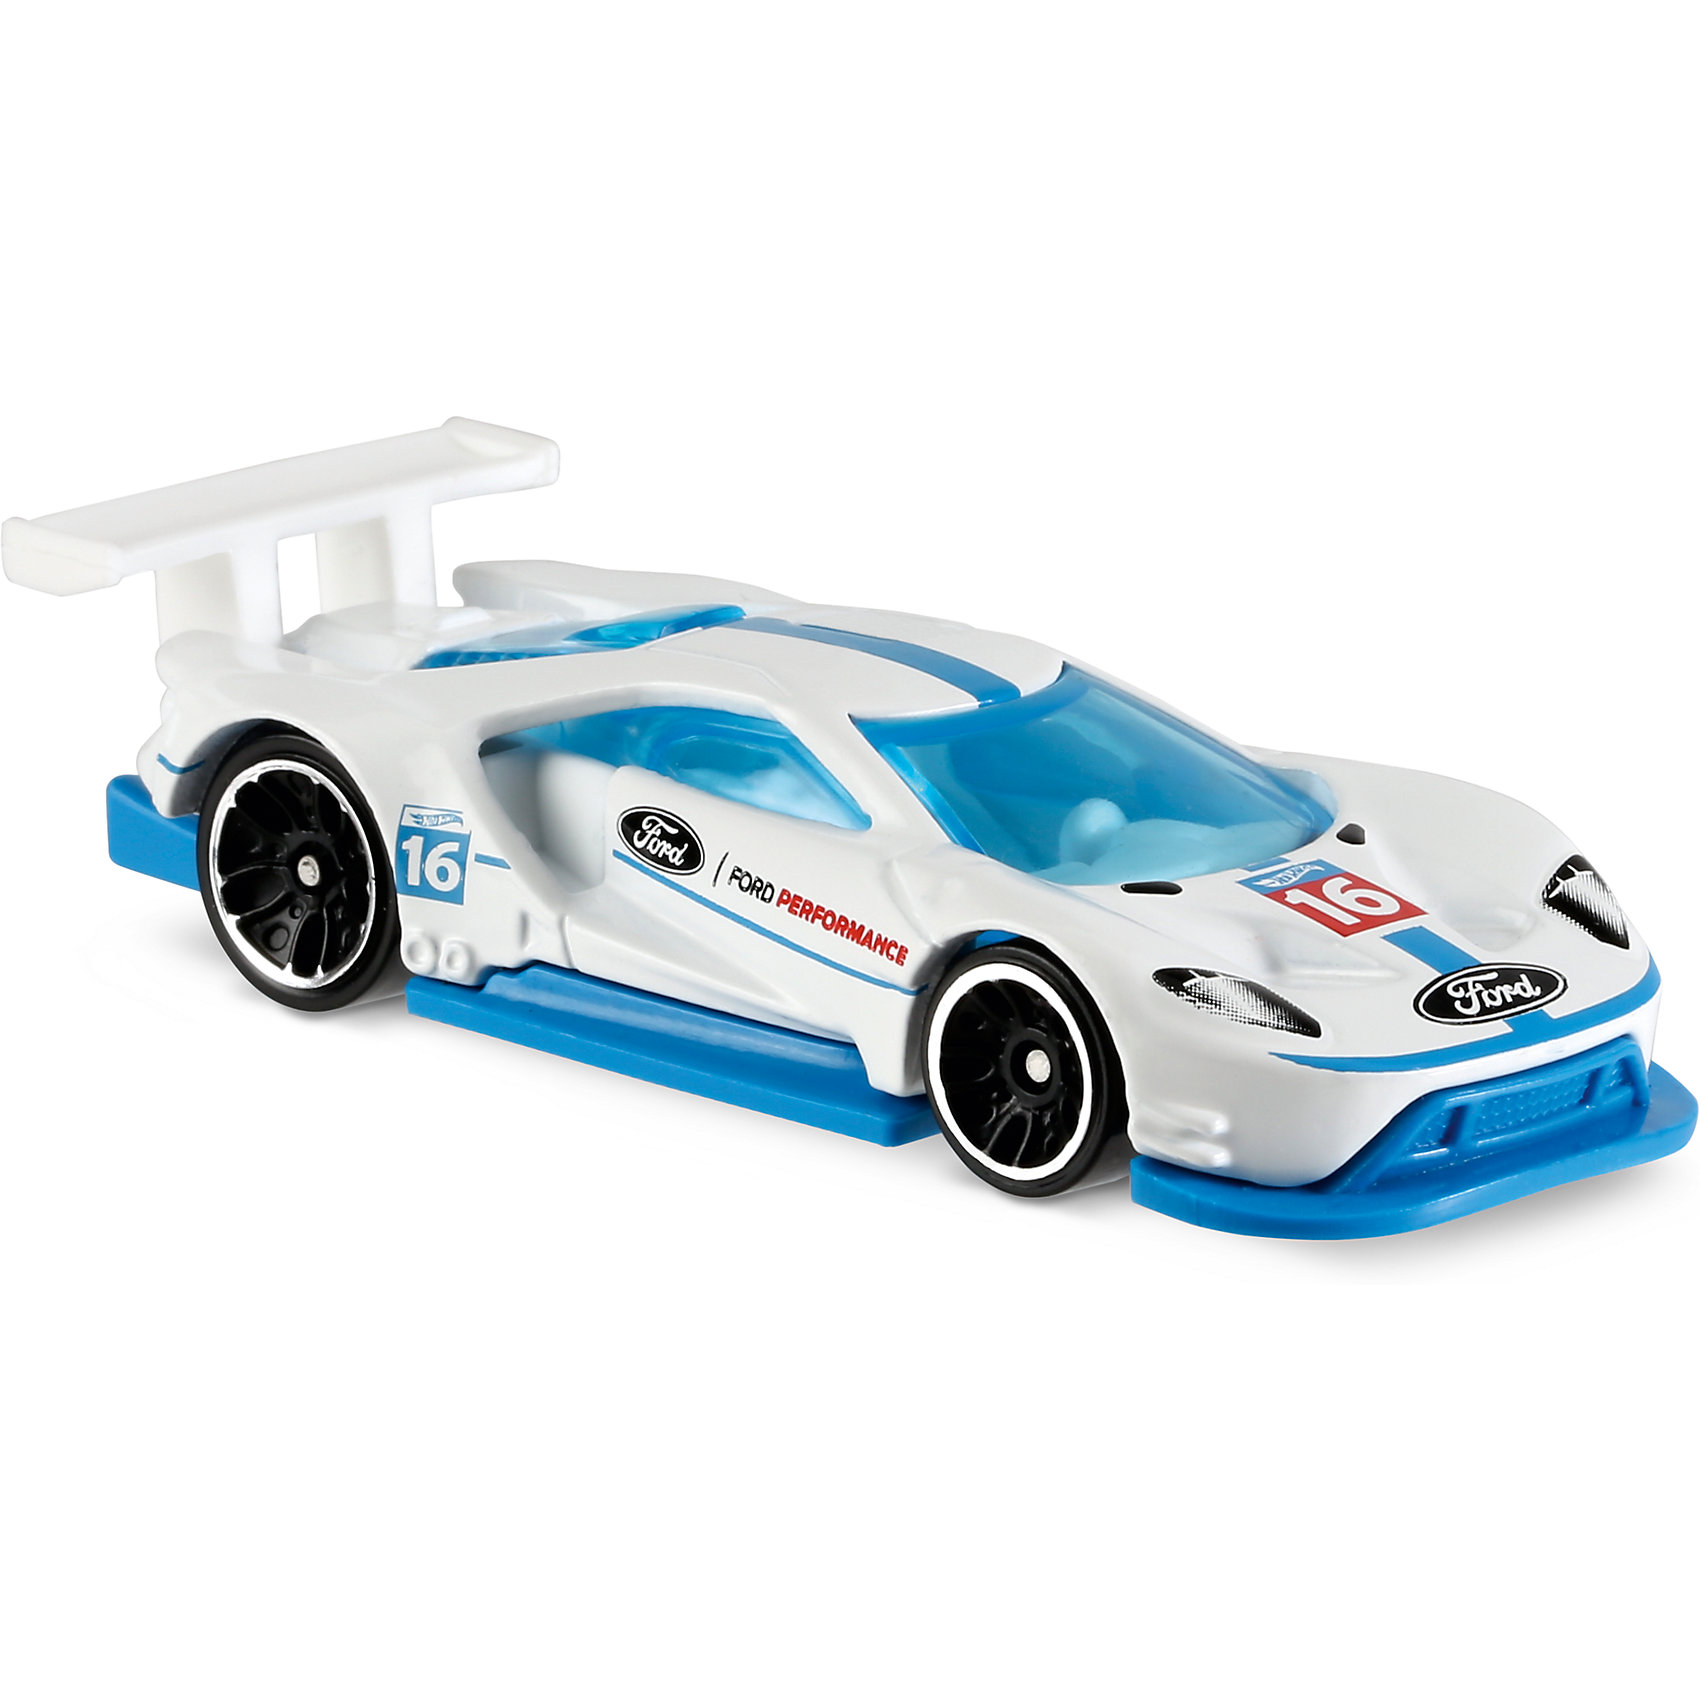 Базовая машинка Hot Wheels, 2016 Ford GT RaceМашинки<br><br><br>Ширина мм: 110<br>Глубина мм: 45<br>Высота мм: 110<br>Вес г: 30<br>Возраст от месяцев: 36<br>Возраст до месяцев: 96<br>Пол: Мужской<br>Возраст: Детский<br>SKU: 7111077